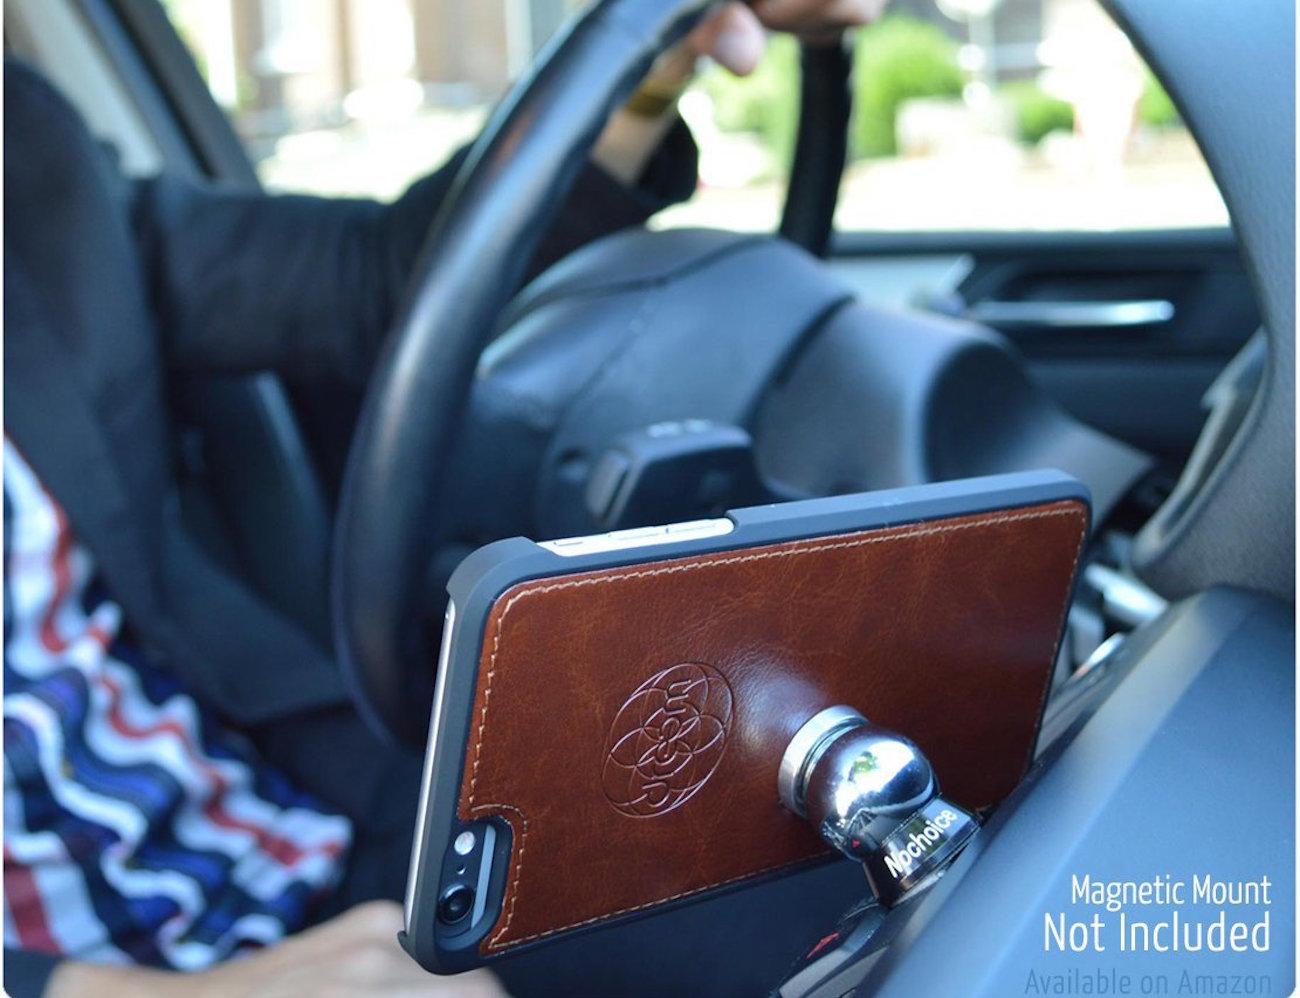 dreem-fibonacci-iphone-wallet-and-stand-case-02